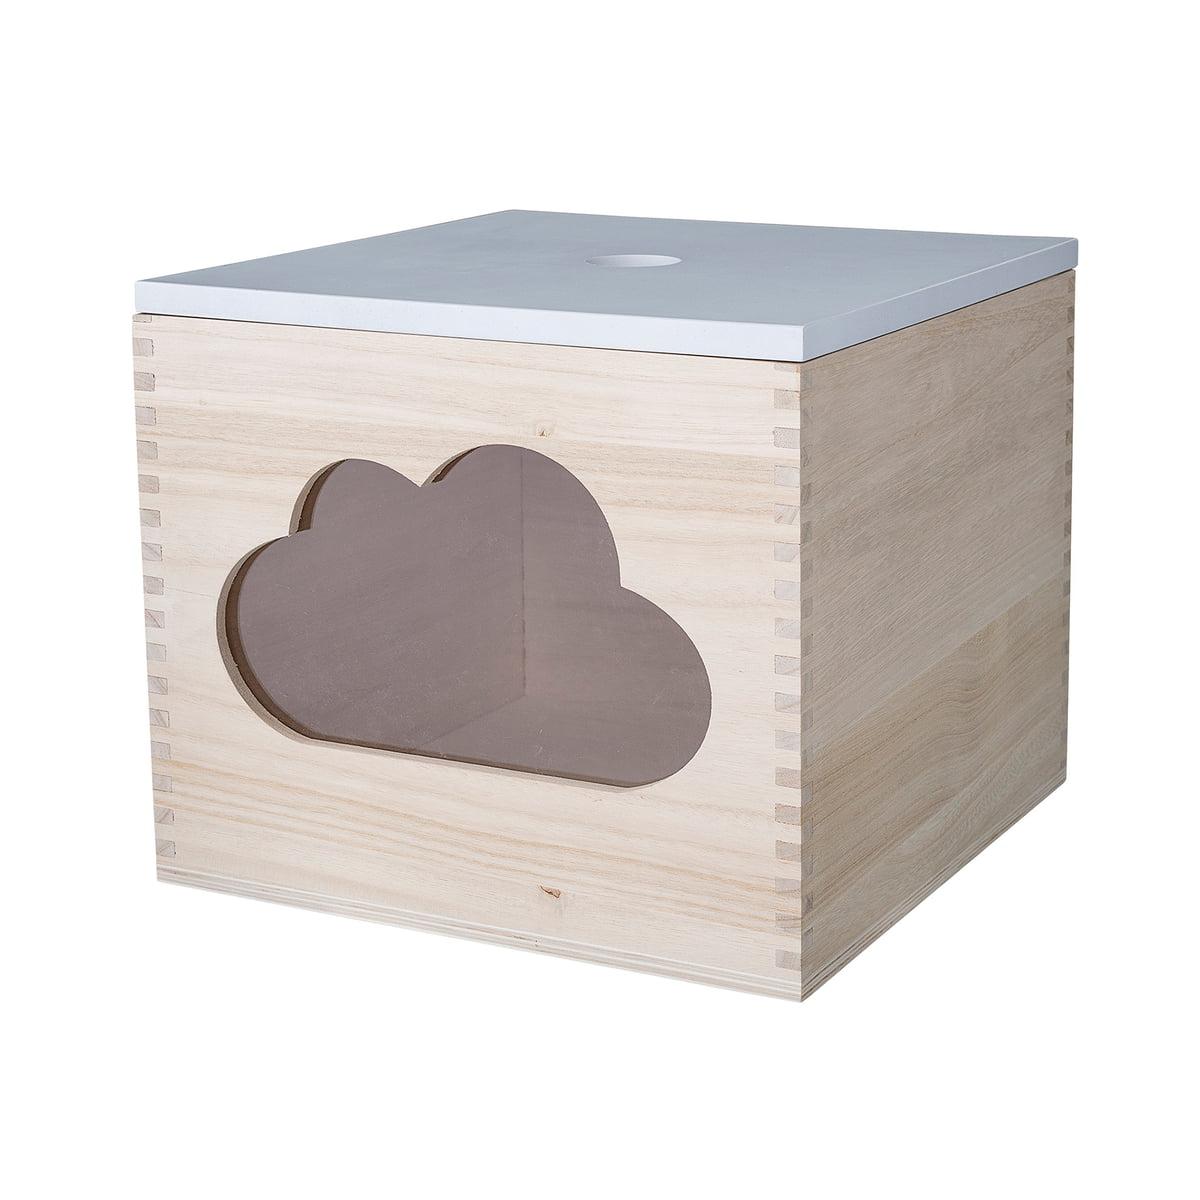 Bloomingville - Spielzeugkiste Wolke, weiß/ natur | Kinderzimmer > Spielzeuge > Spielzeugkisten | Hellbraun | Paulowniaholz -  plexiglas | Bloomingville